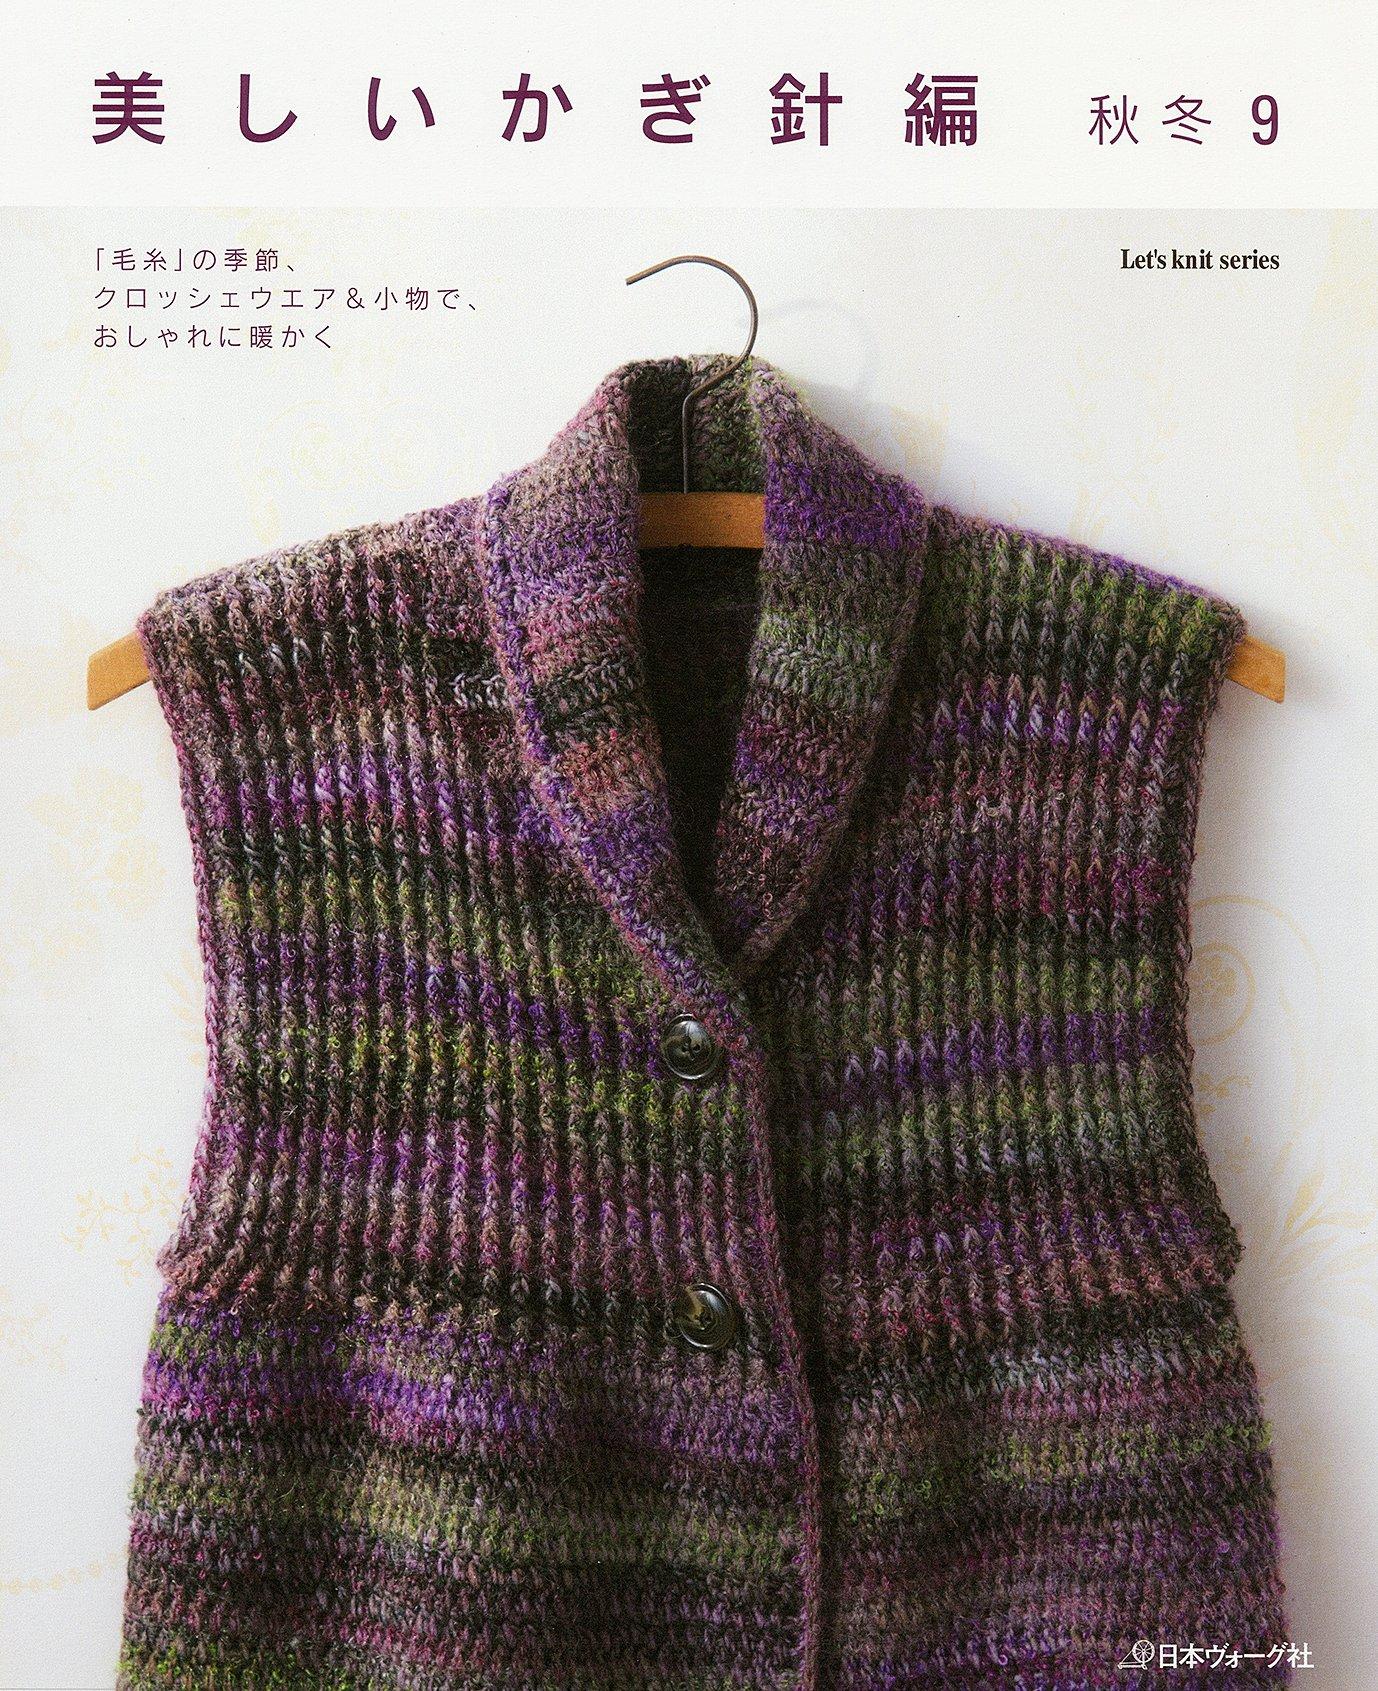 Beautiful crochet 9 Autumn and Winter 2016